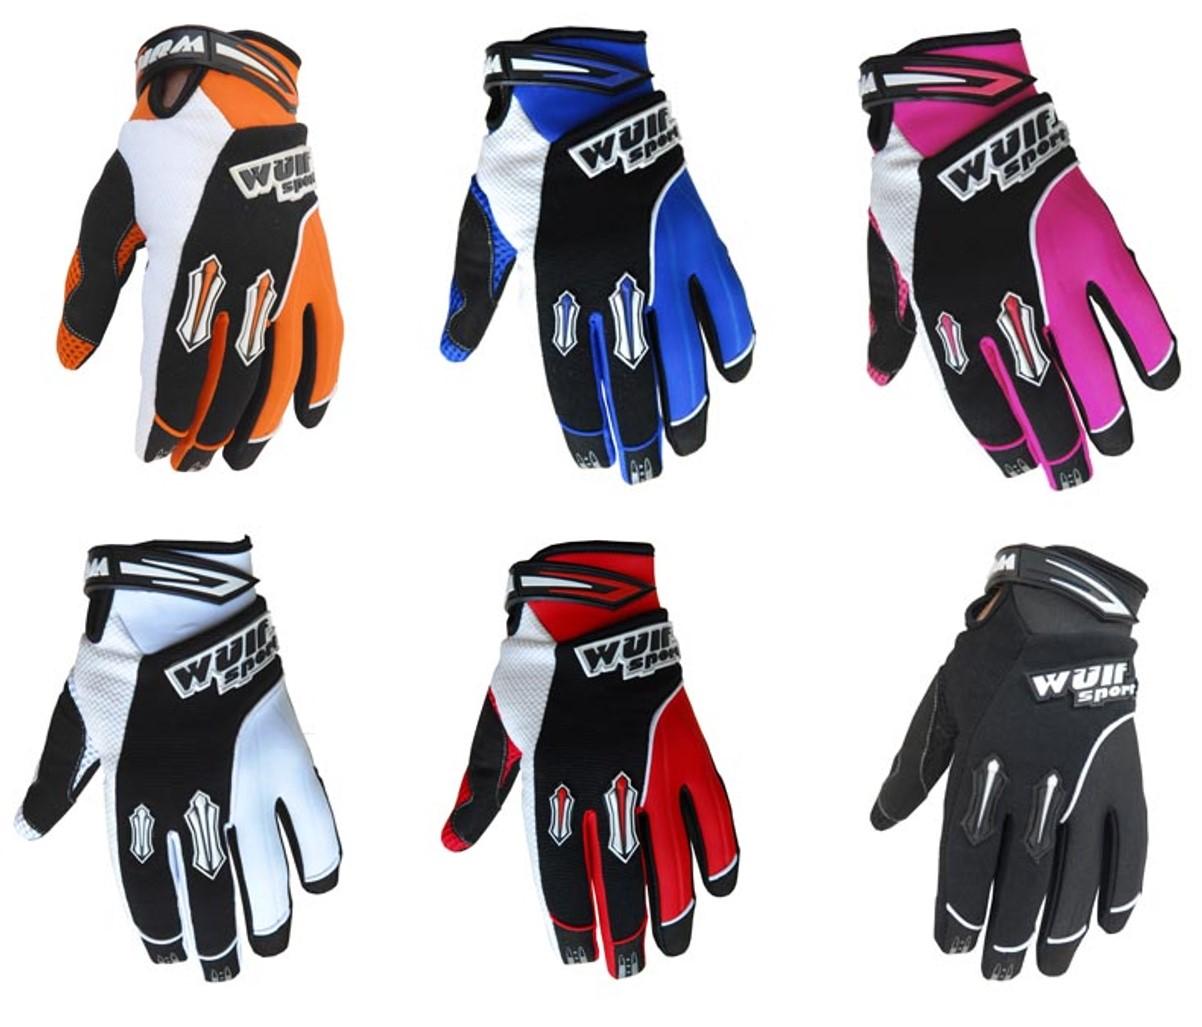 Wulfsport-Cubs-Gloves-Stratos-Assorted.jpg